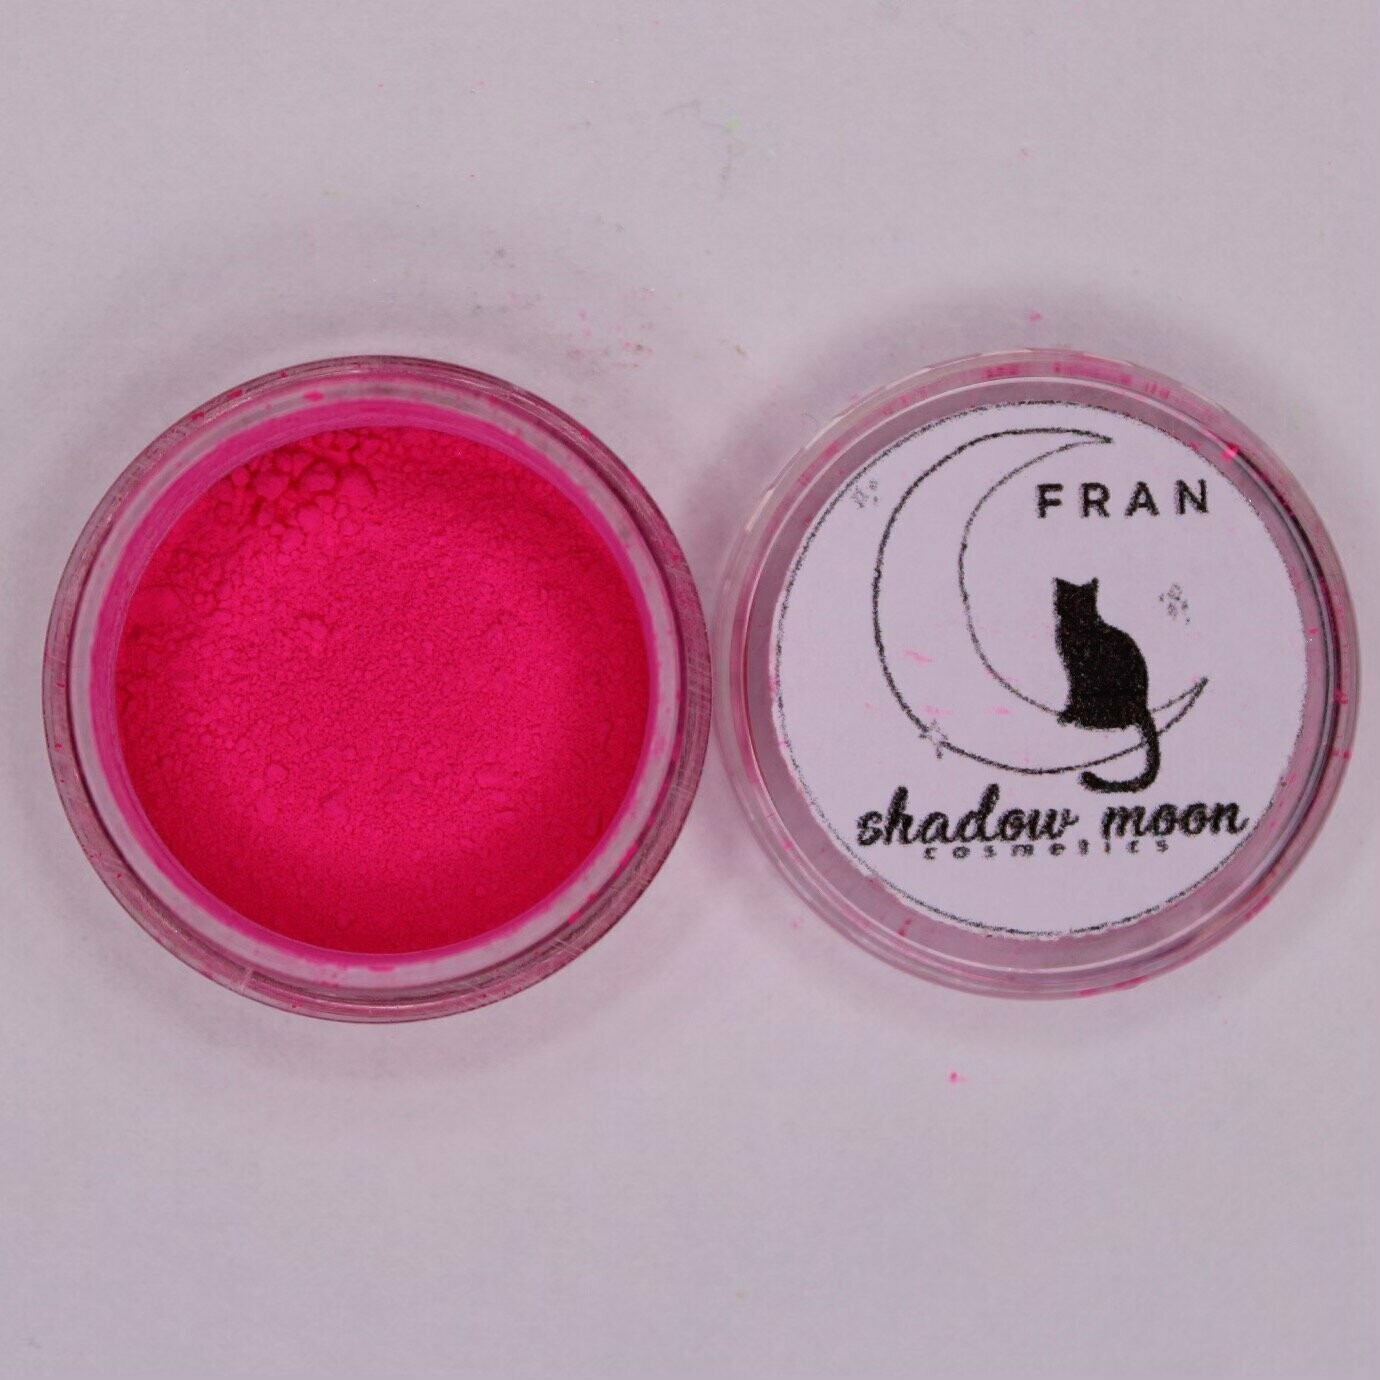 Fran - Neon Pigment